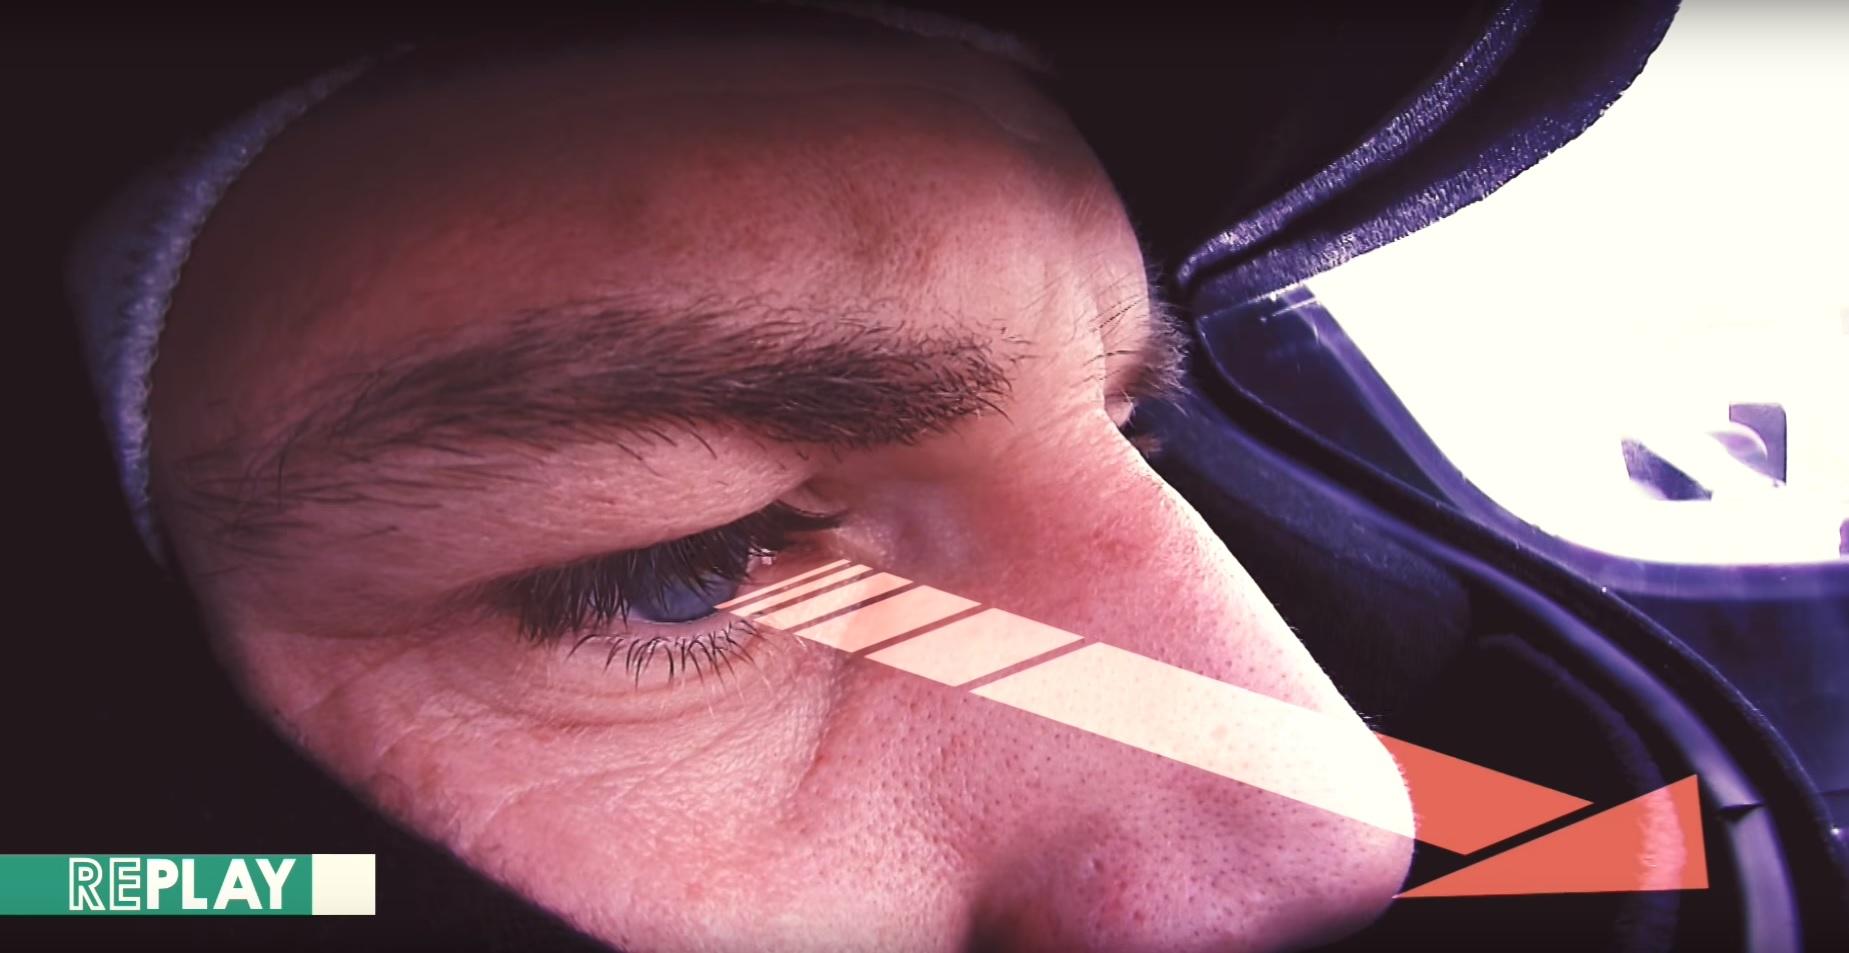 monitoreo  ocular